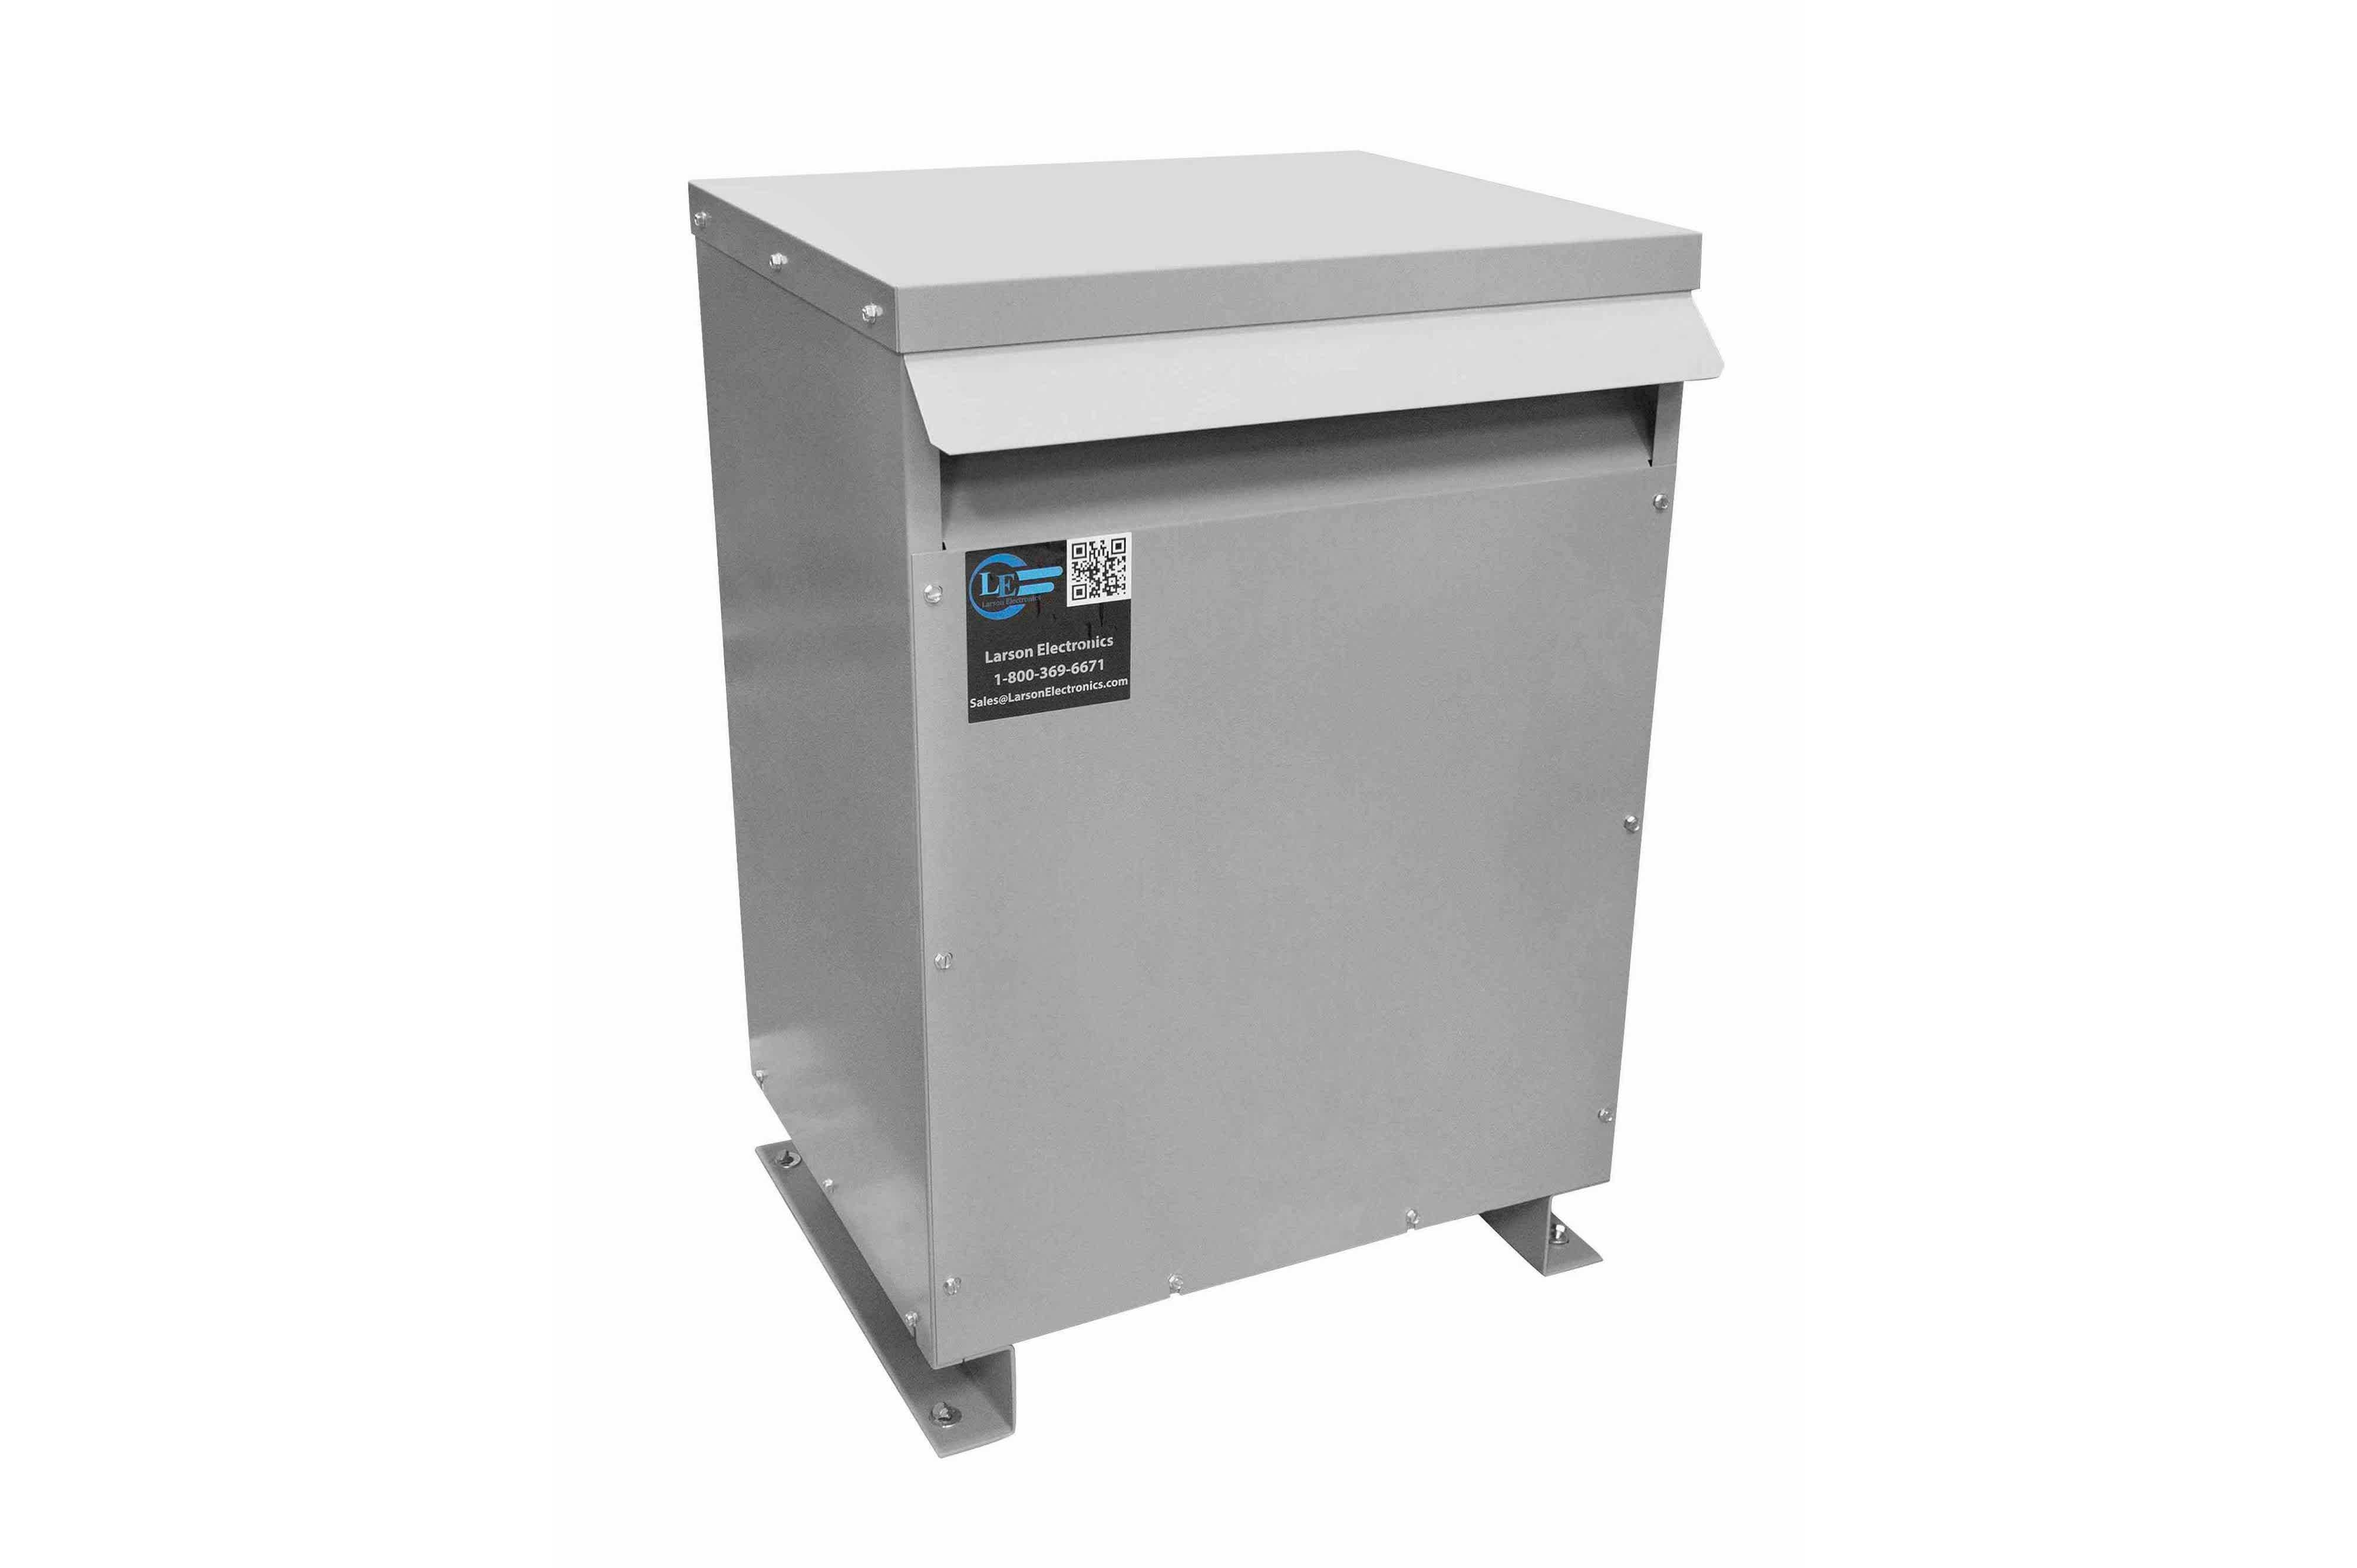 100 kVA 3PH Isolation Transformer, 440V Wye Primary, 240V Delta Secondary, N3R, Ventilated, 60 Hz